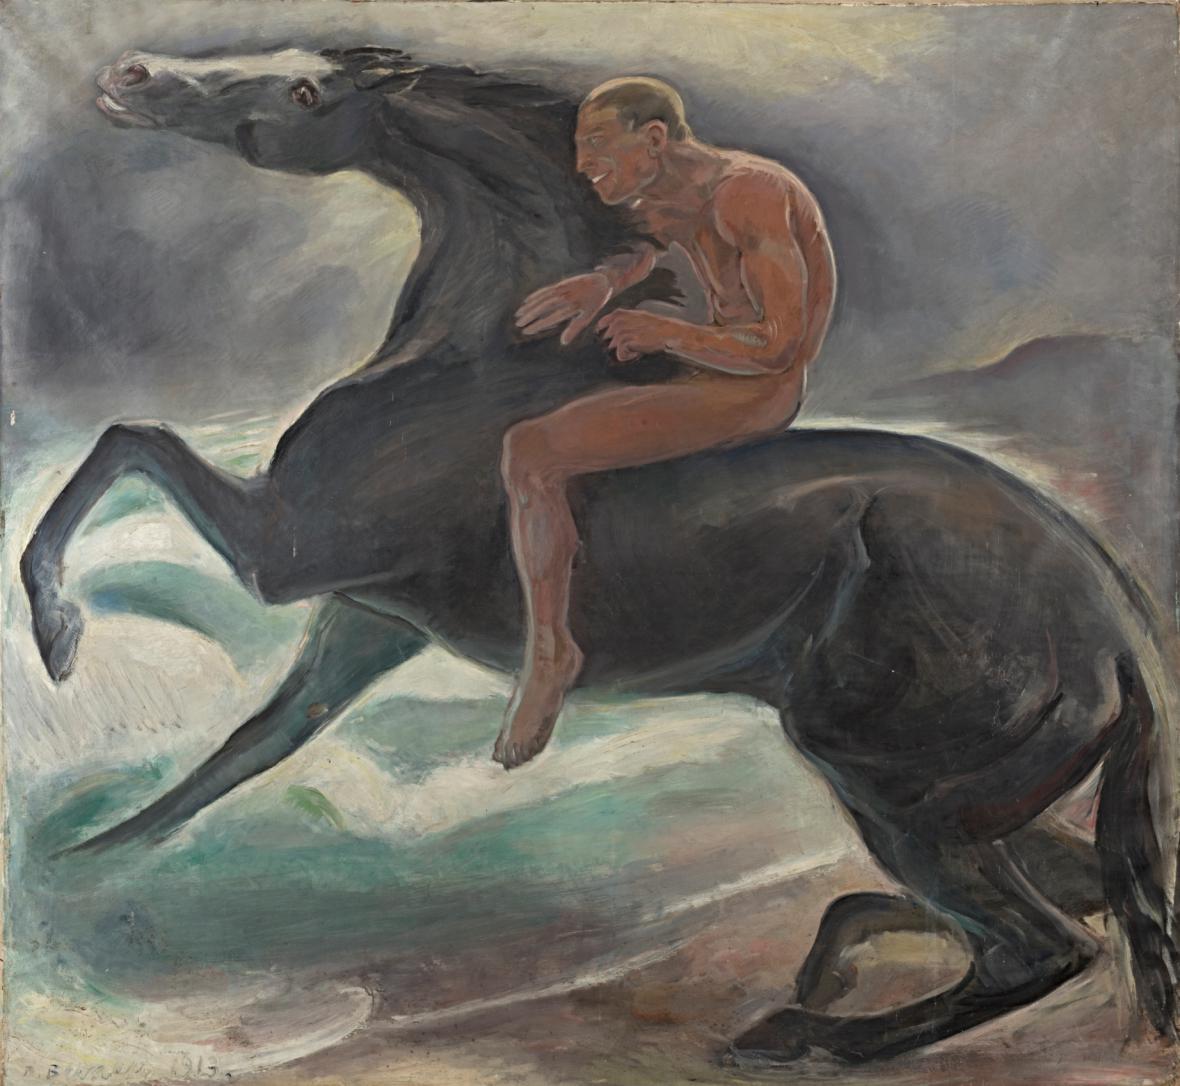 Benno Berneis / Jezdec u moře, 1913